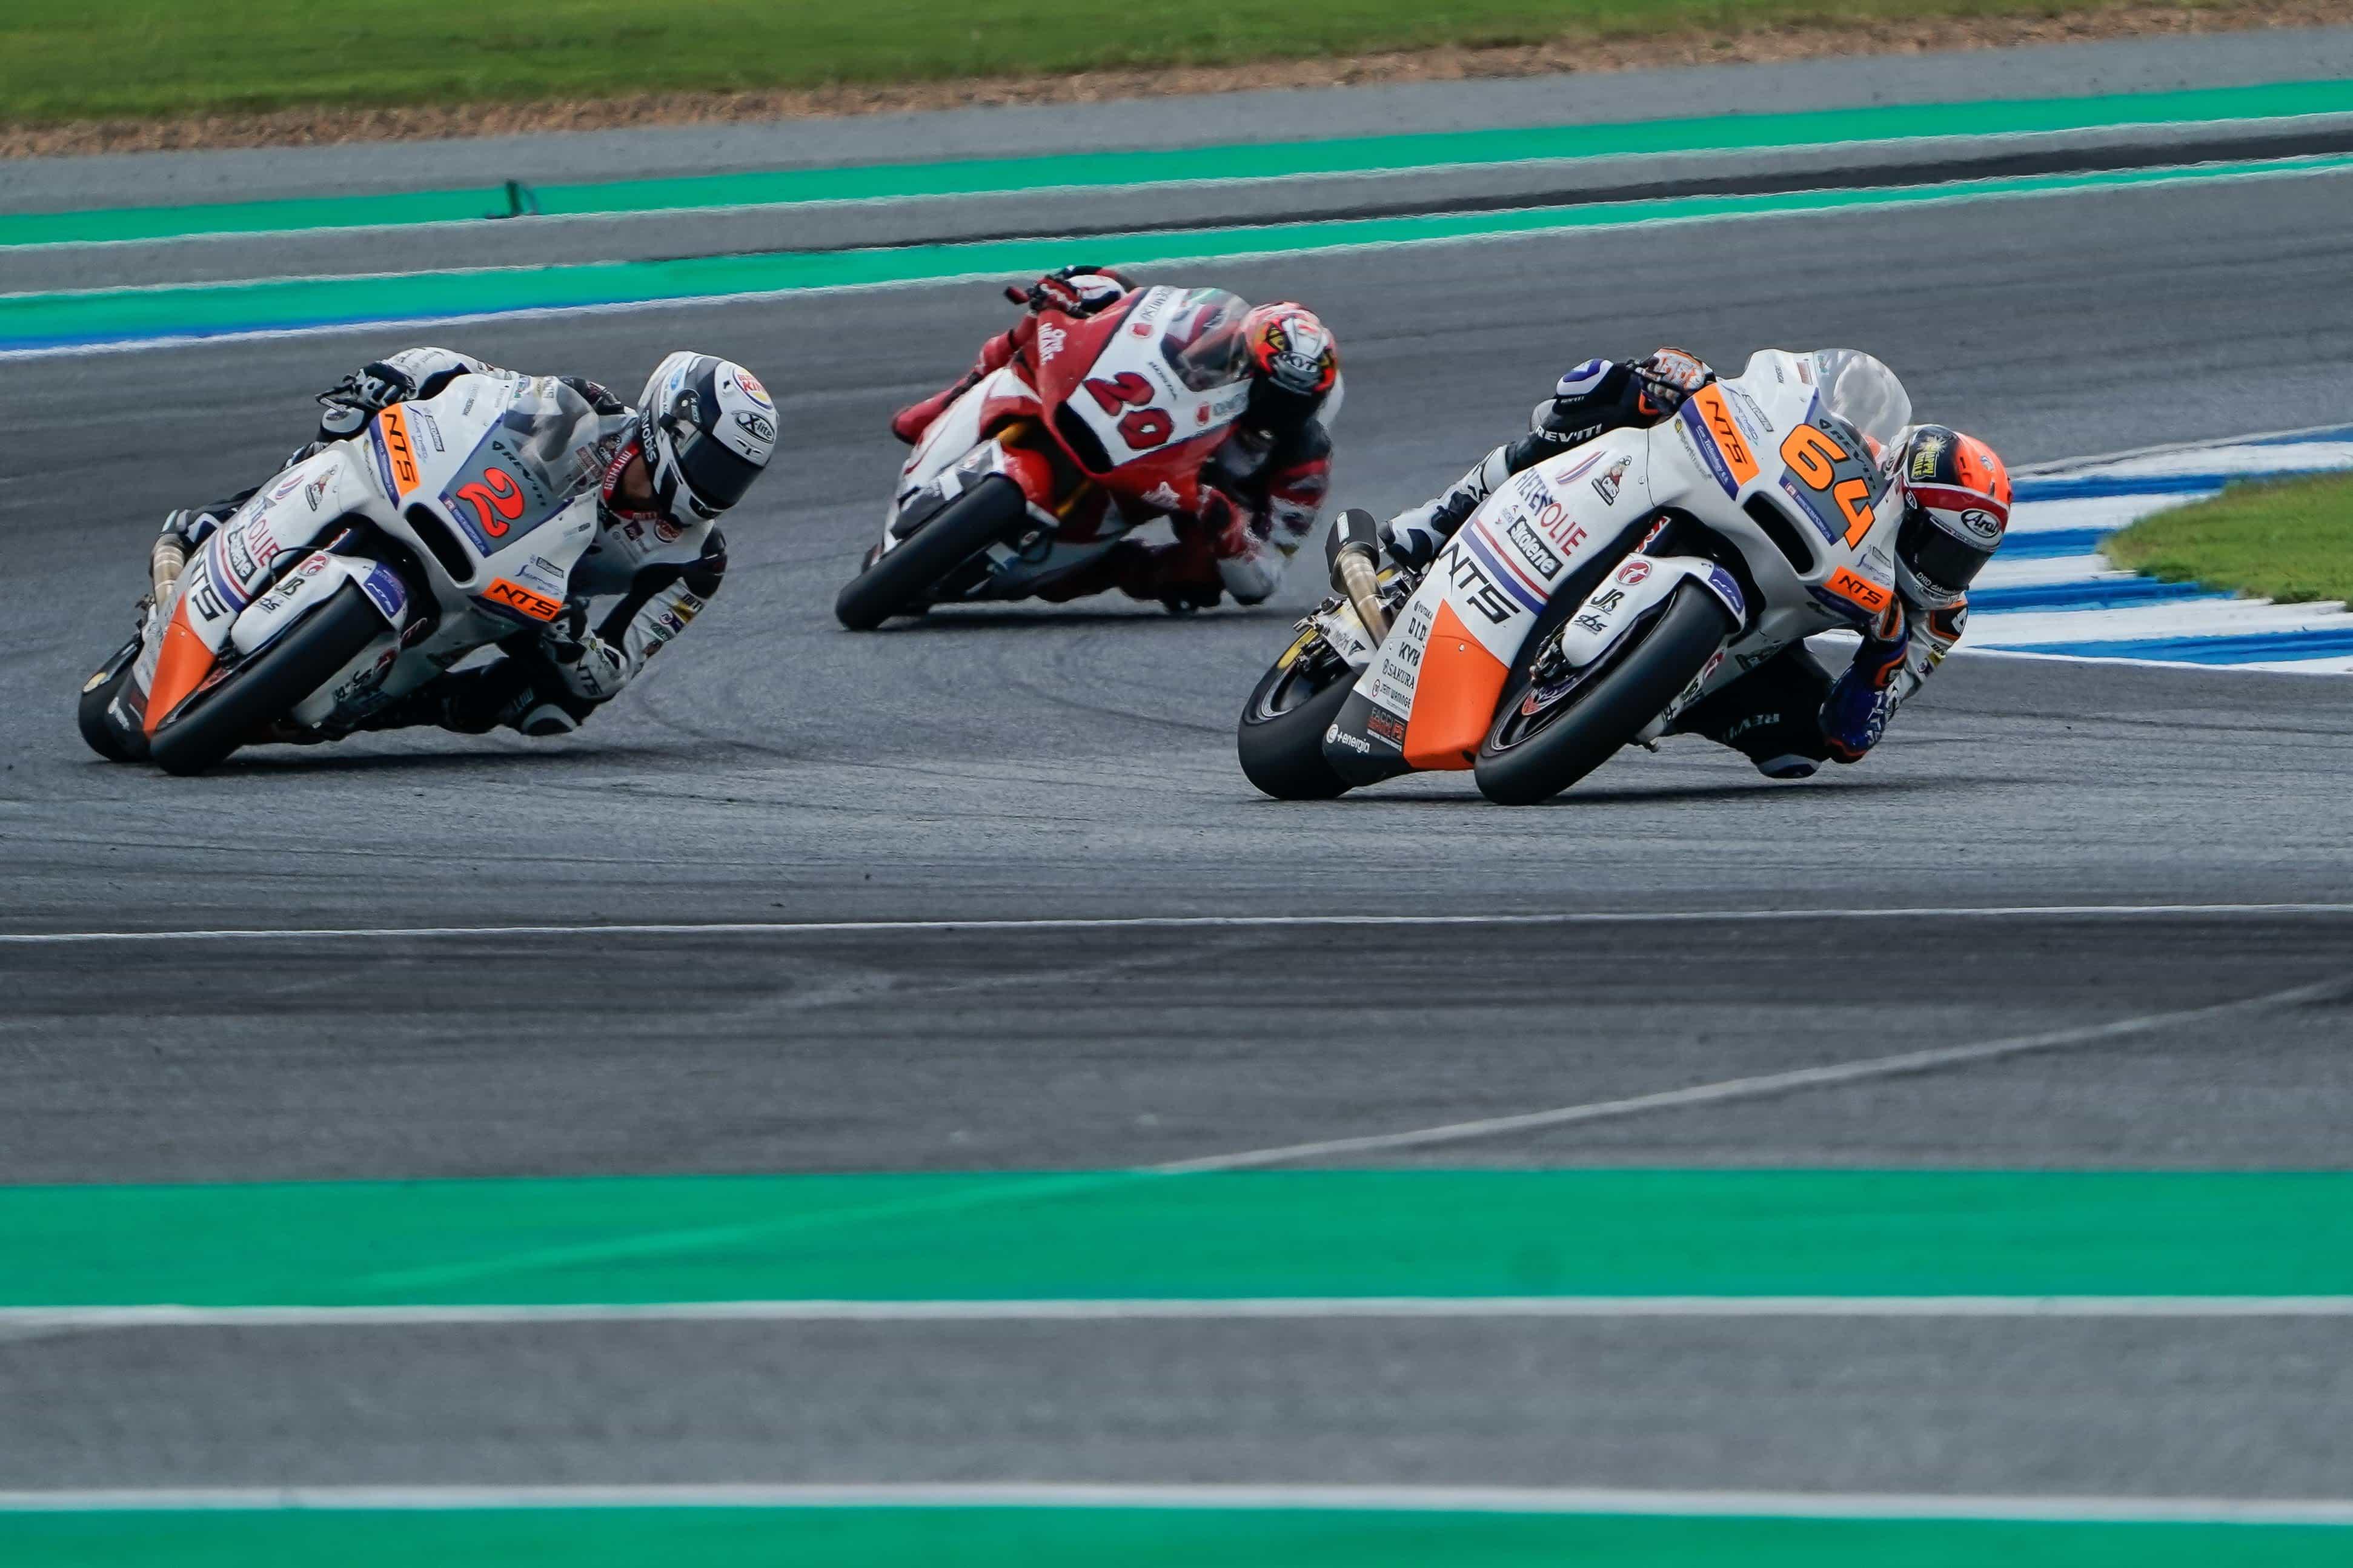 NTS RW Racing GP タイGP決勝レースレポート